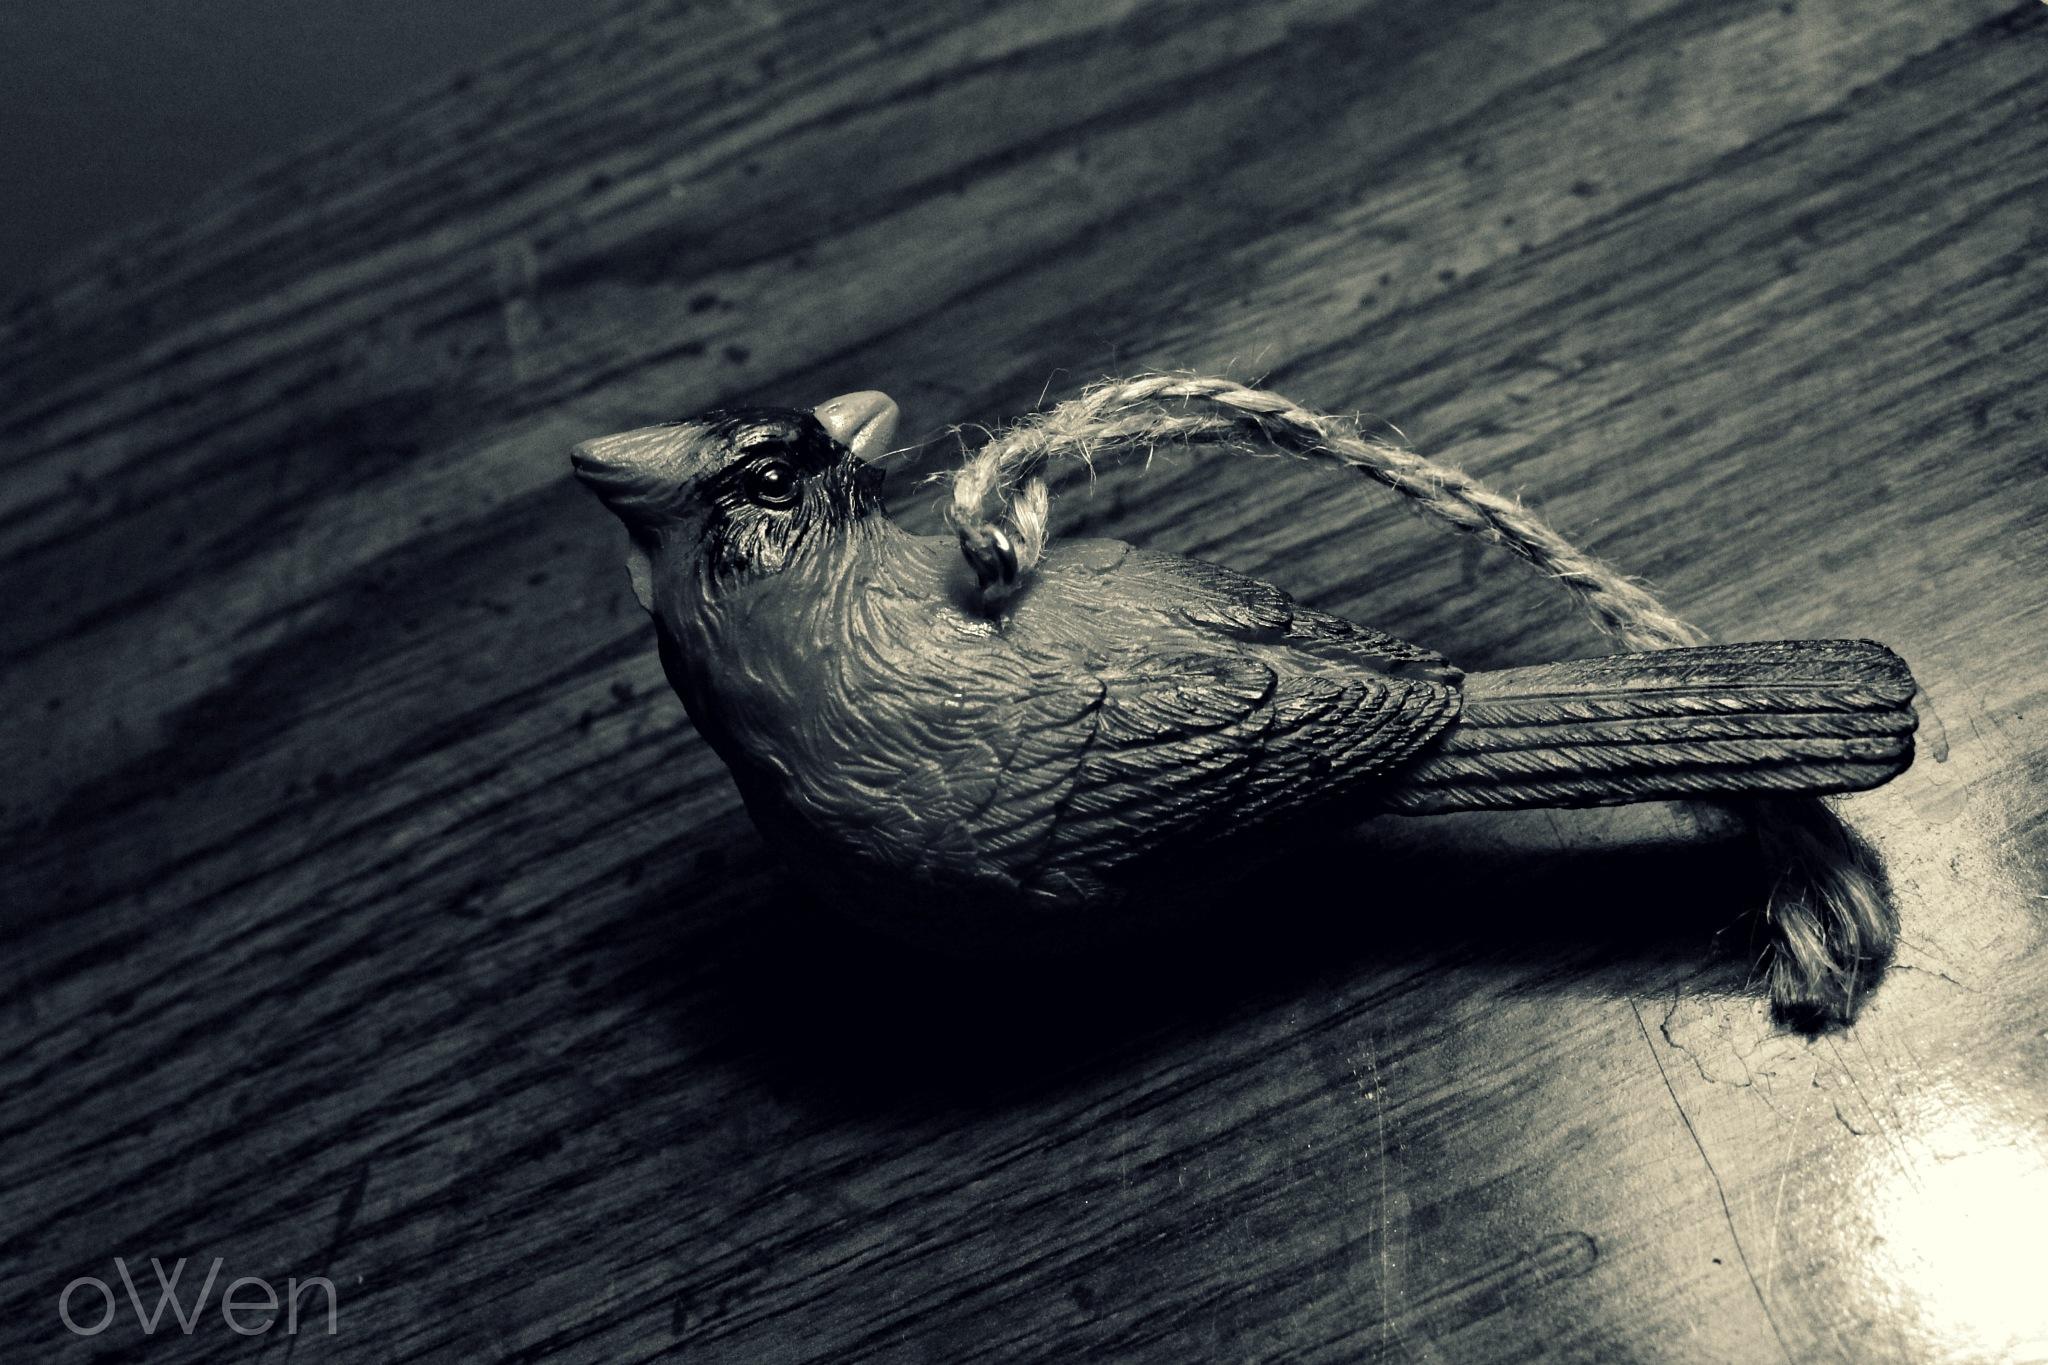 Ornament by Blane Owen